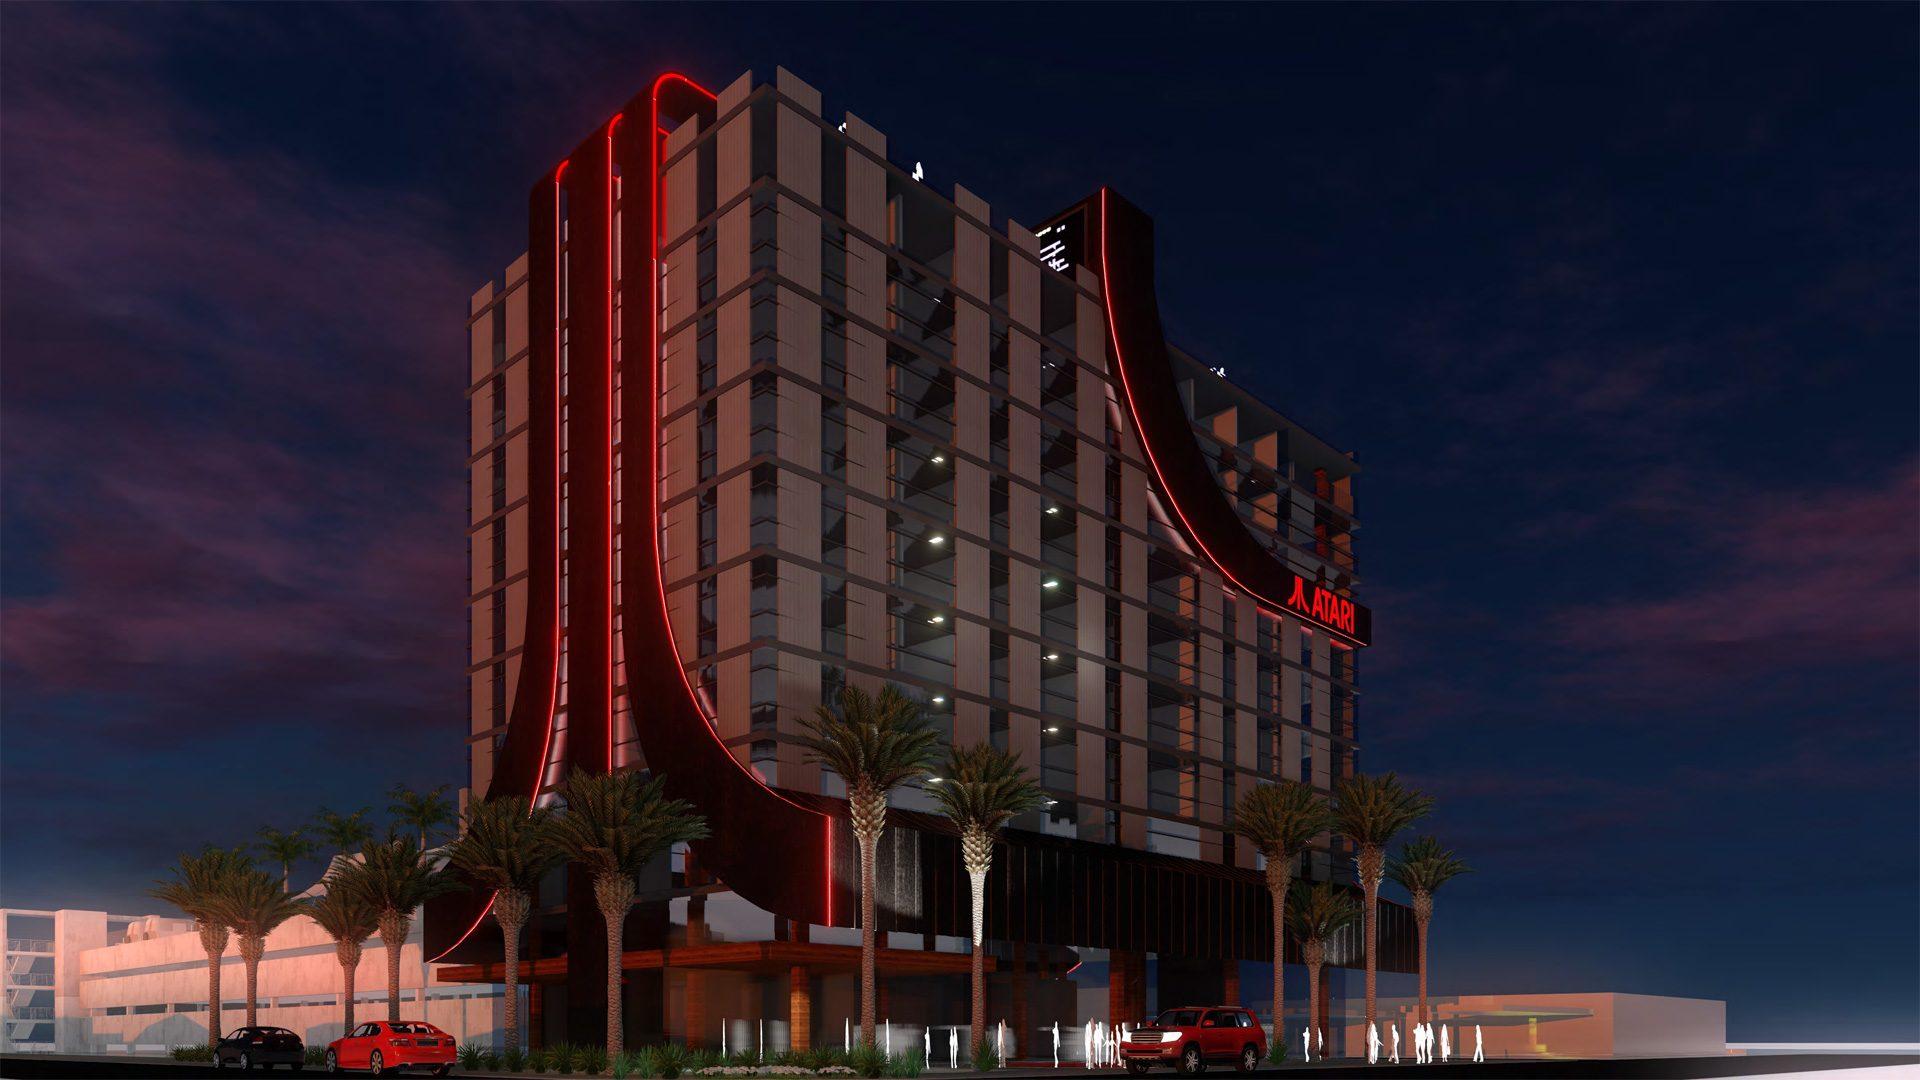 Concepto de los futuros hoteles de Atari